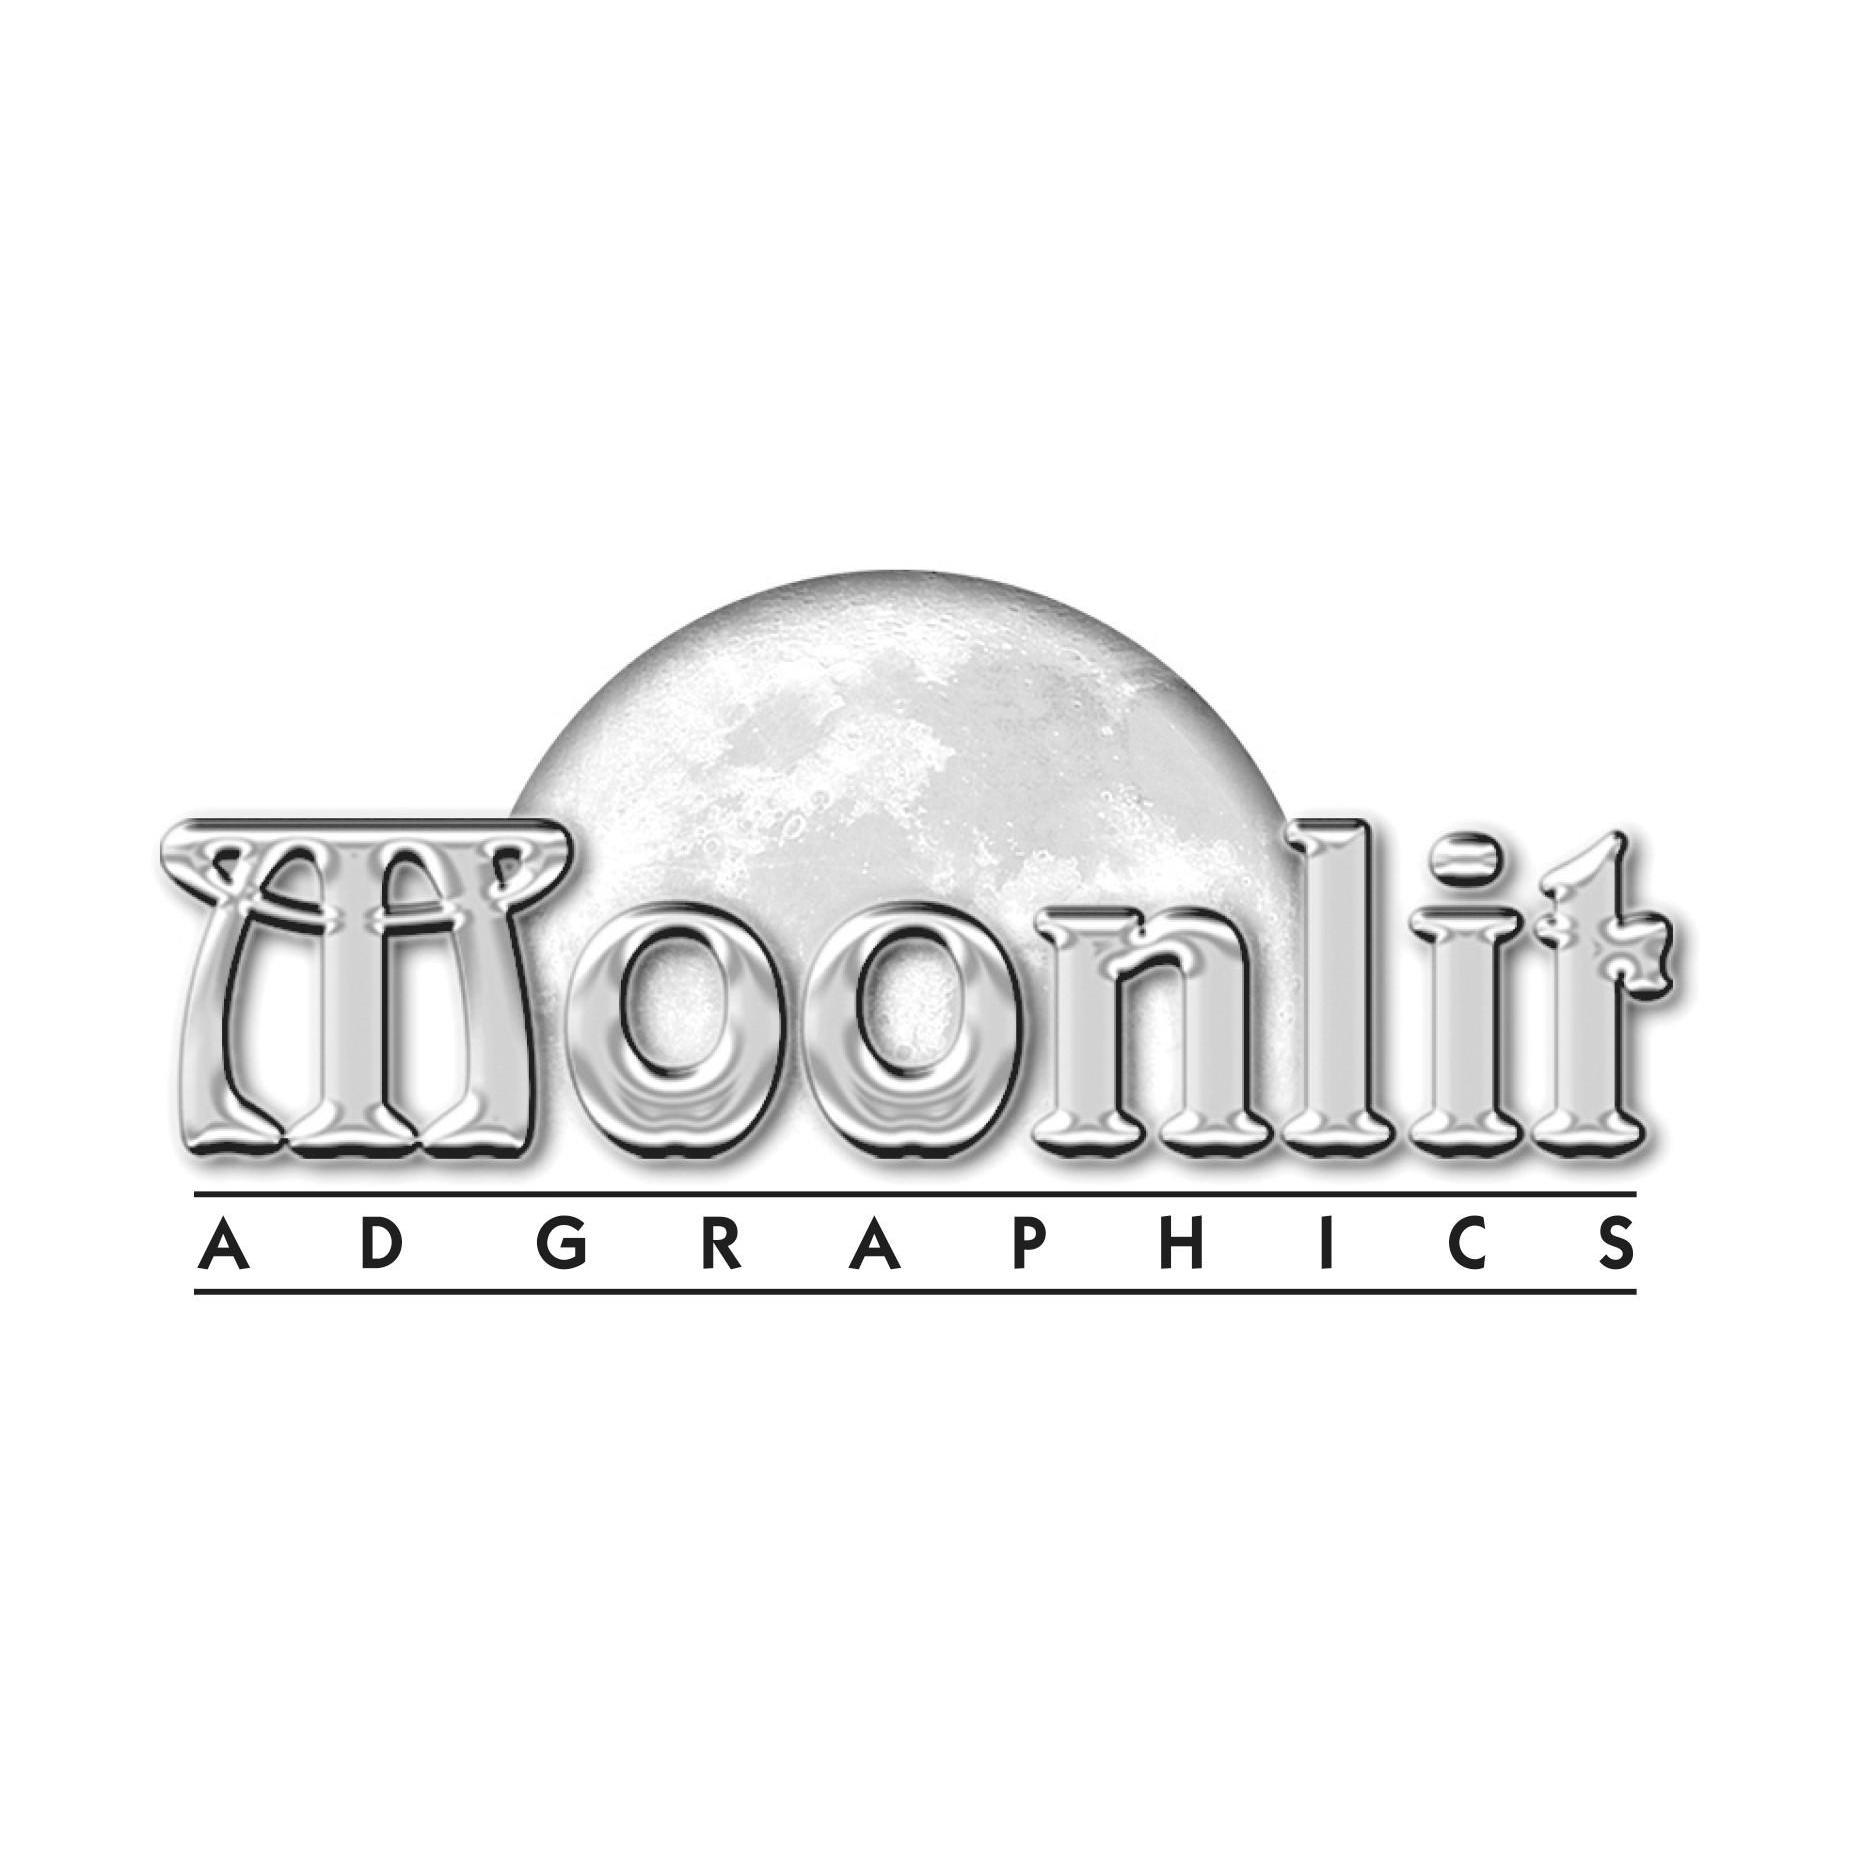 Moonlit Ad Graphics